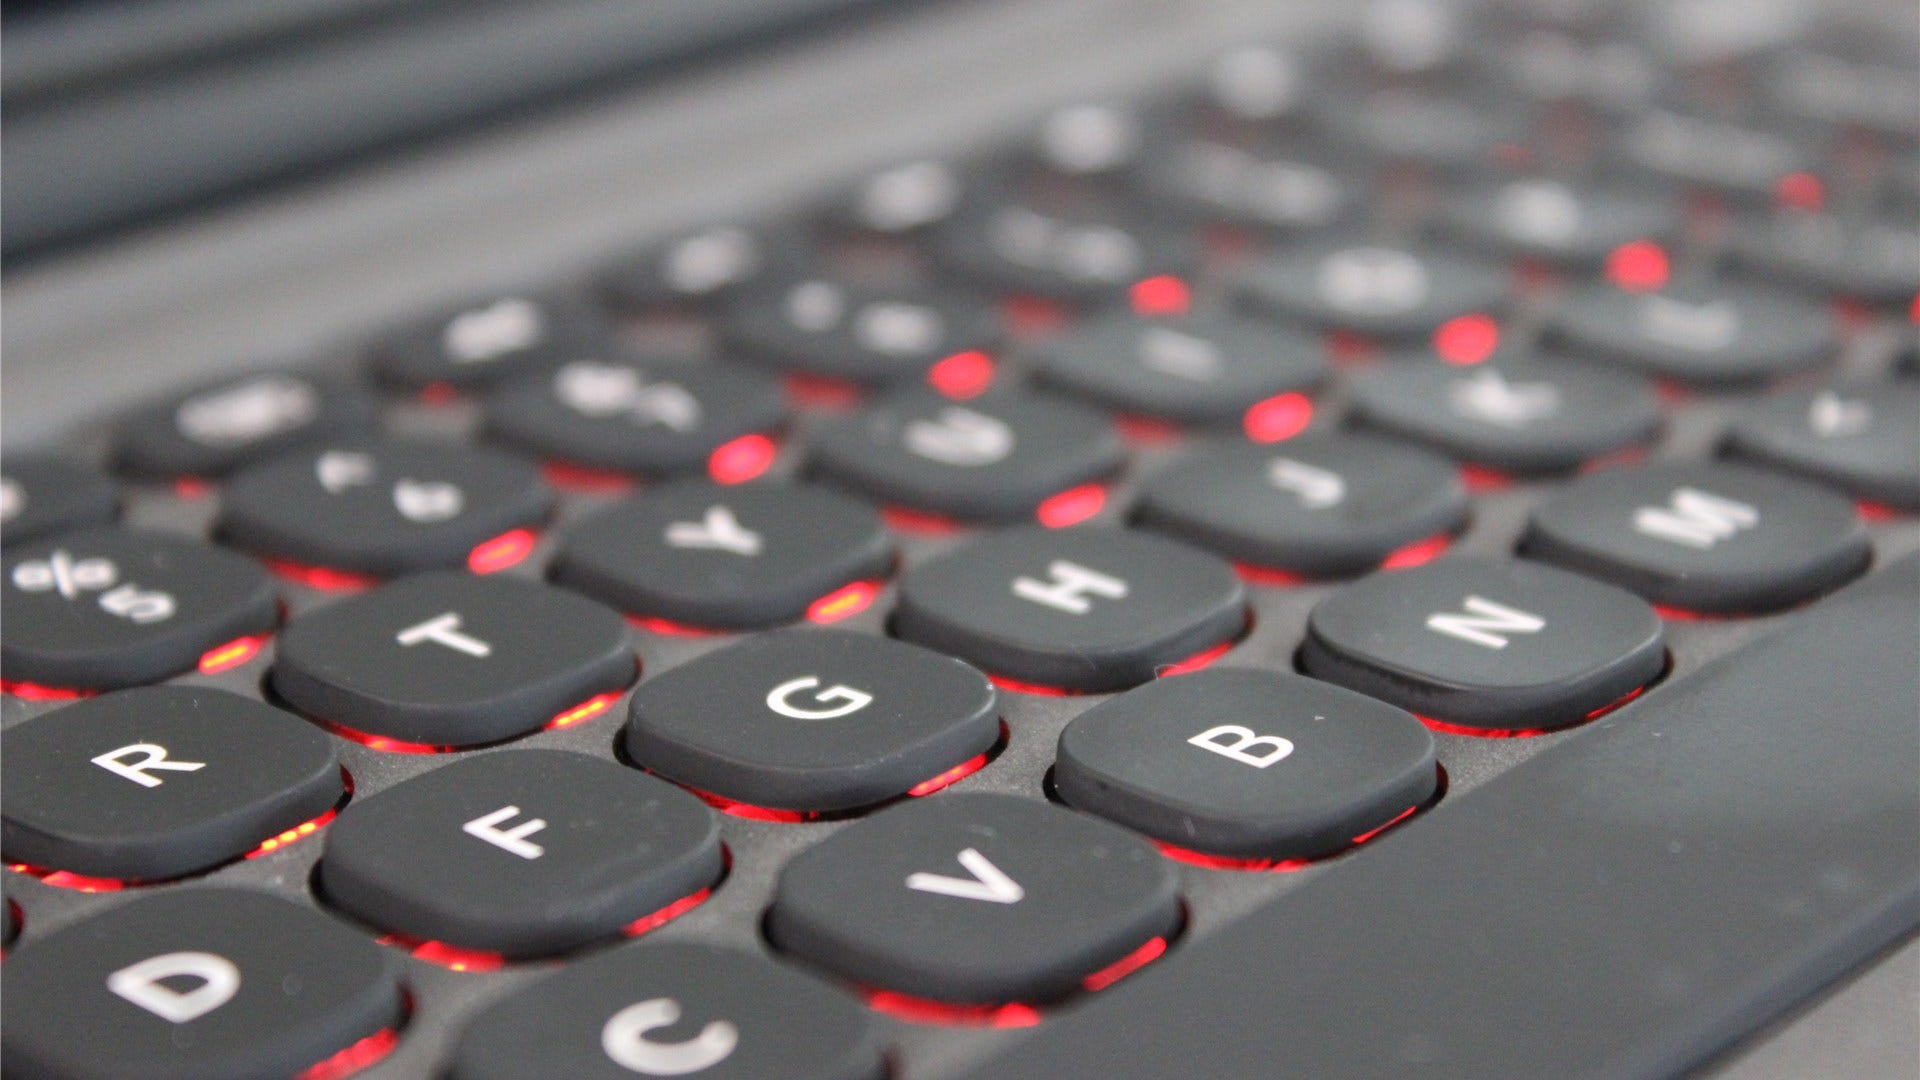 ZAGG Slim Book Go with red backlit keys